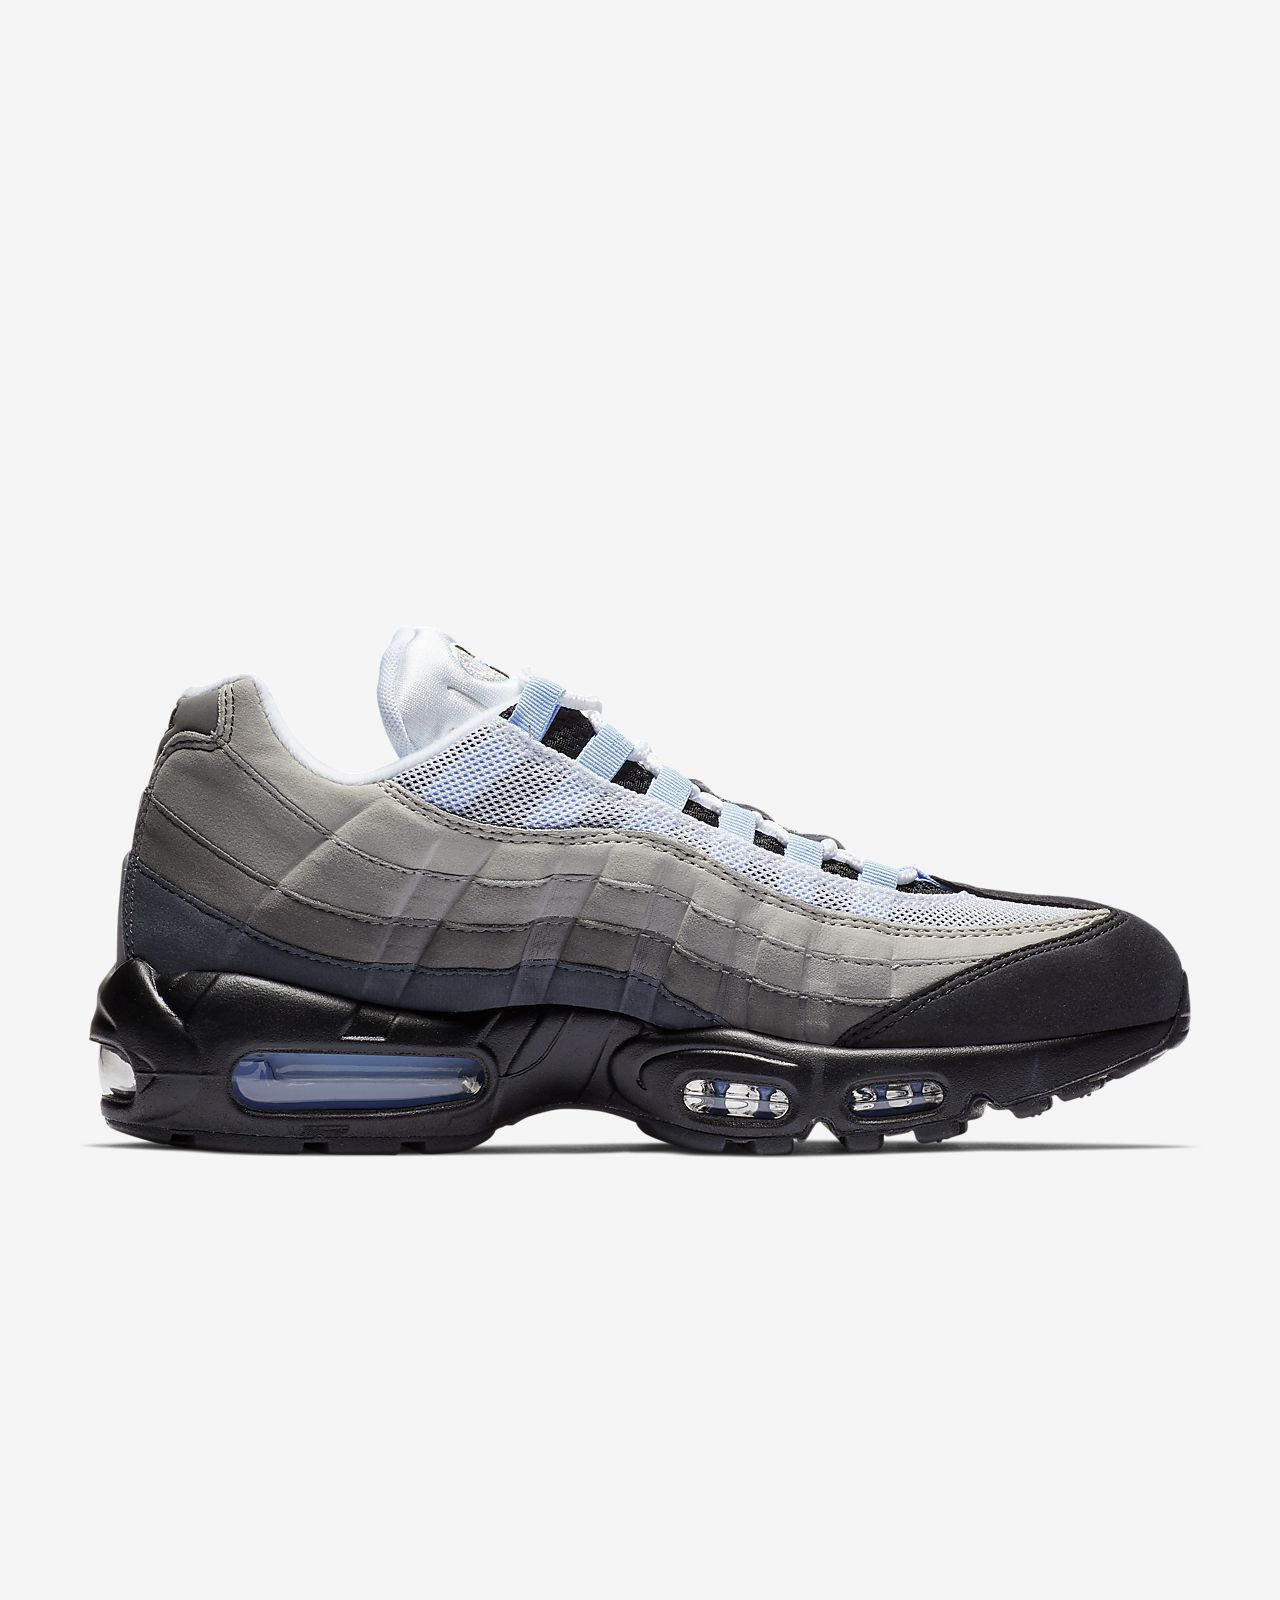 reputable site 8eae2 1401b ... Scarpa Nike Air Max 95 - Uomo